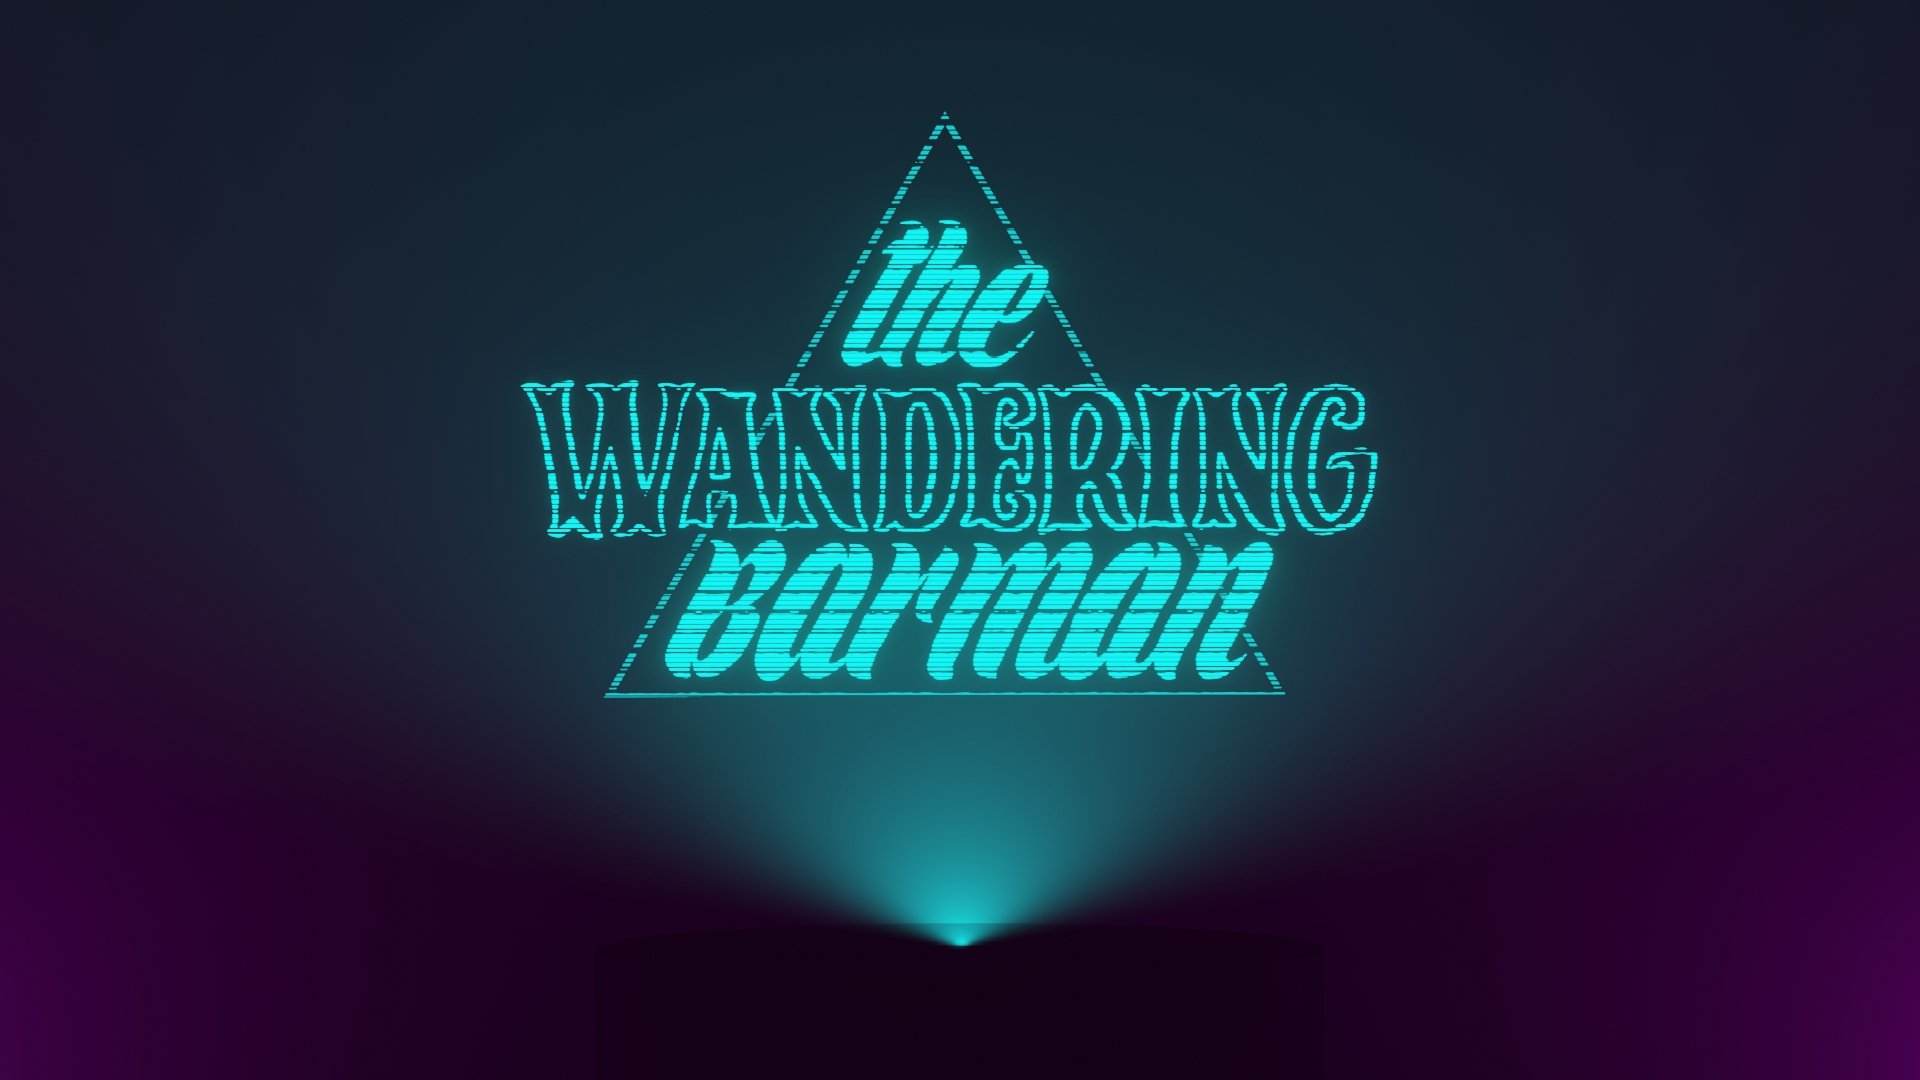 The Wandering Barman